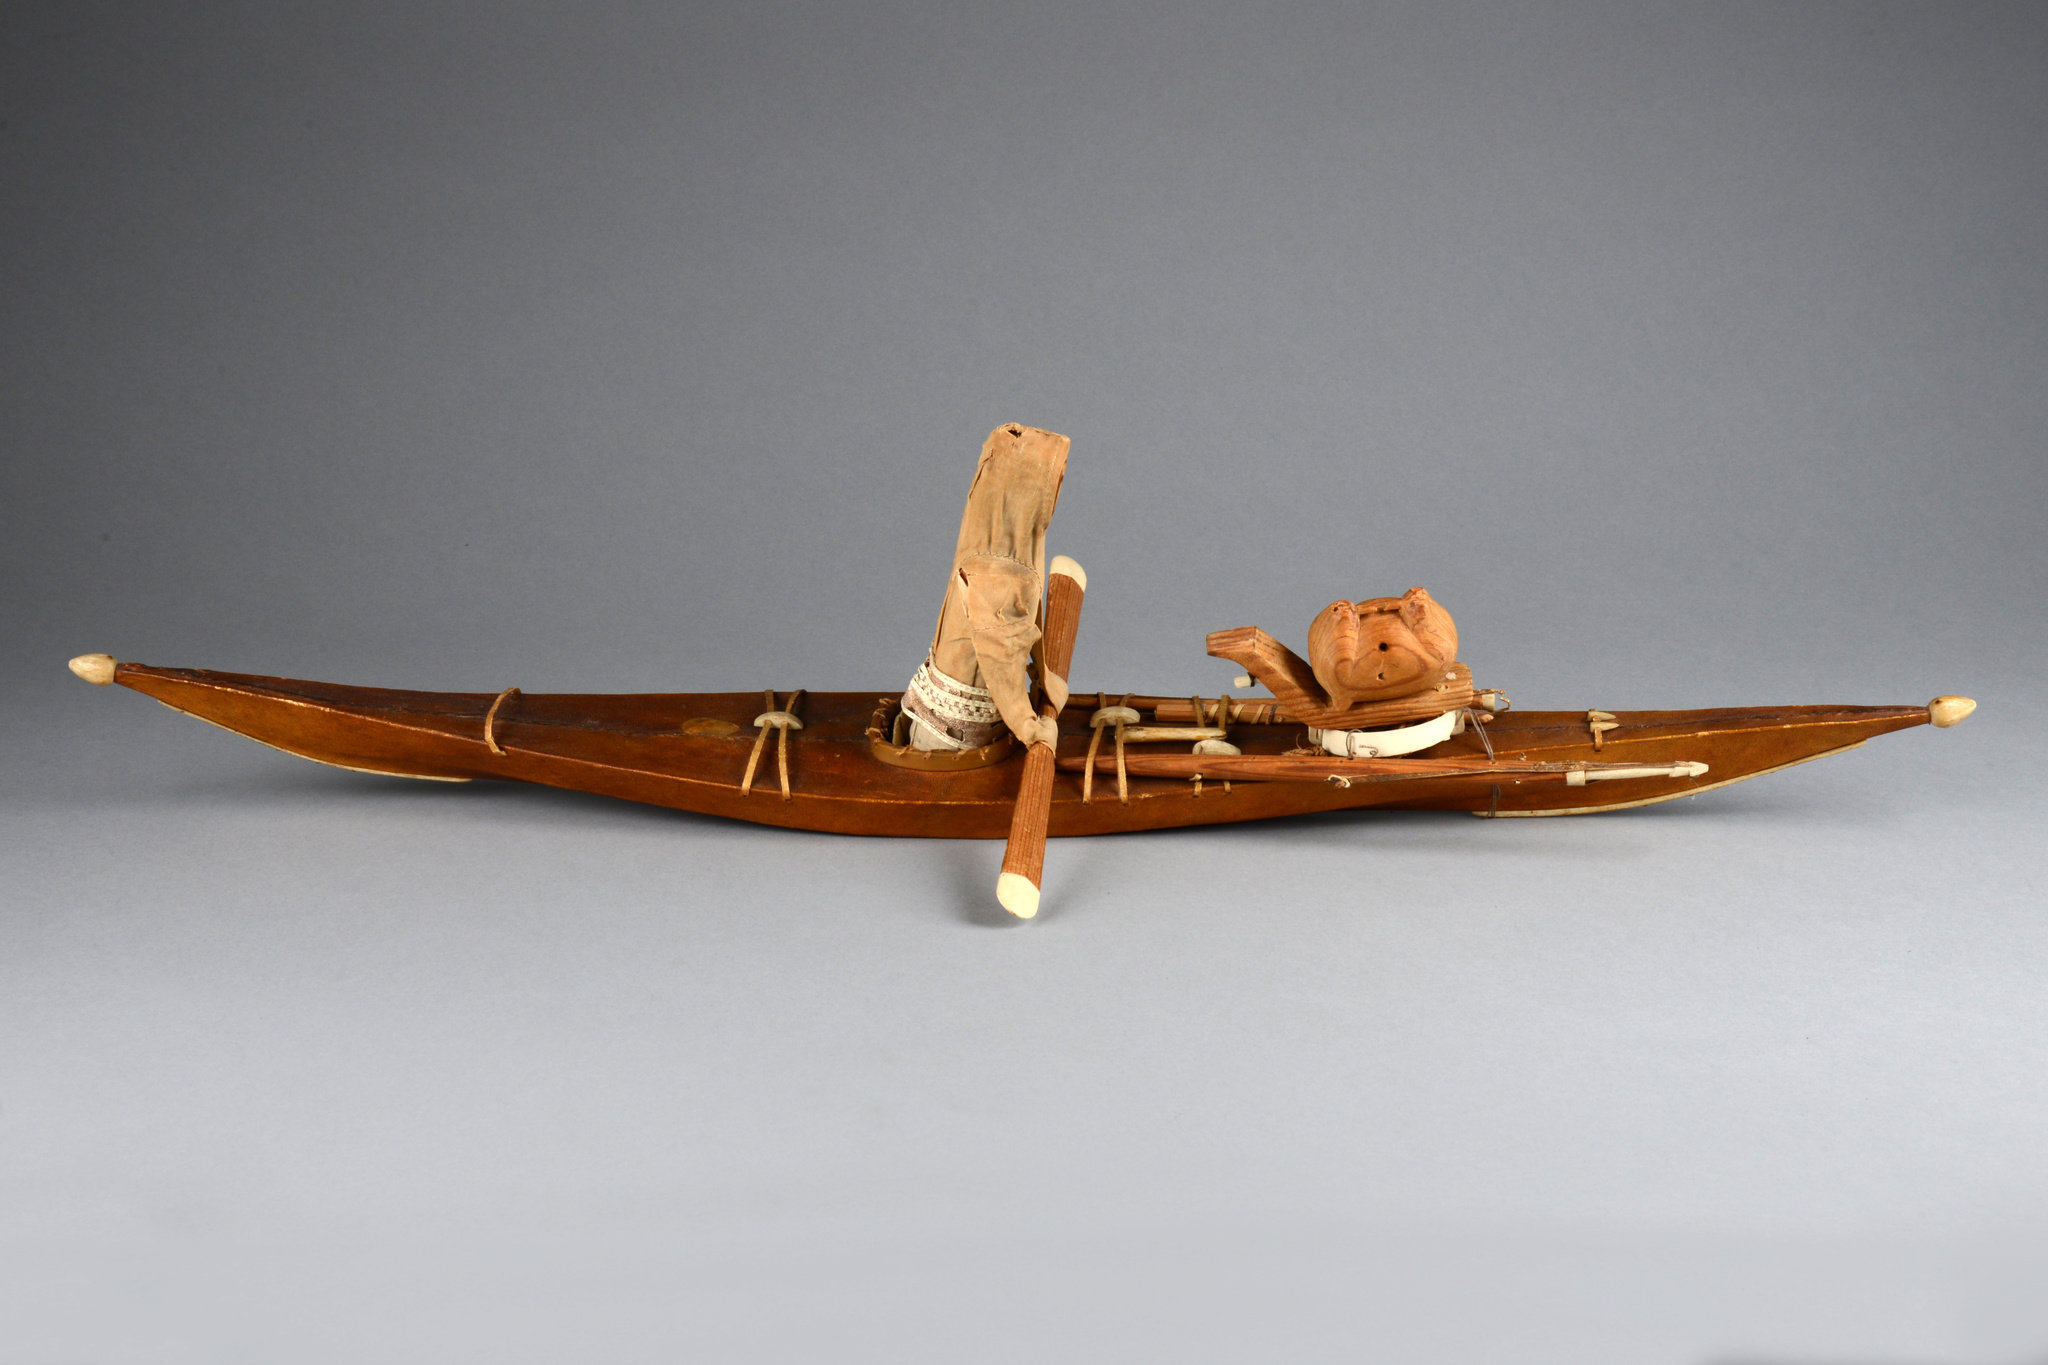 Modell eines Inuit-Kajaks